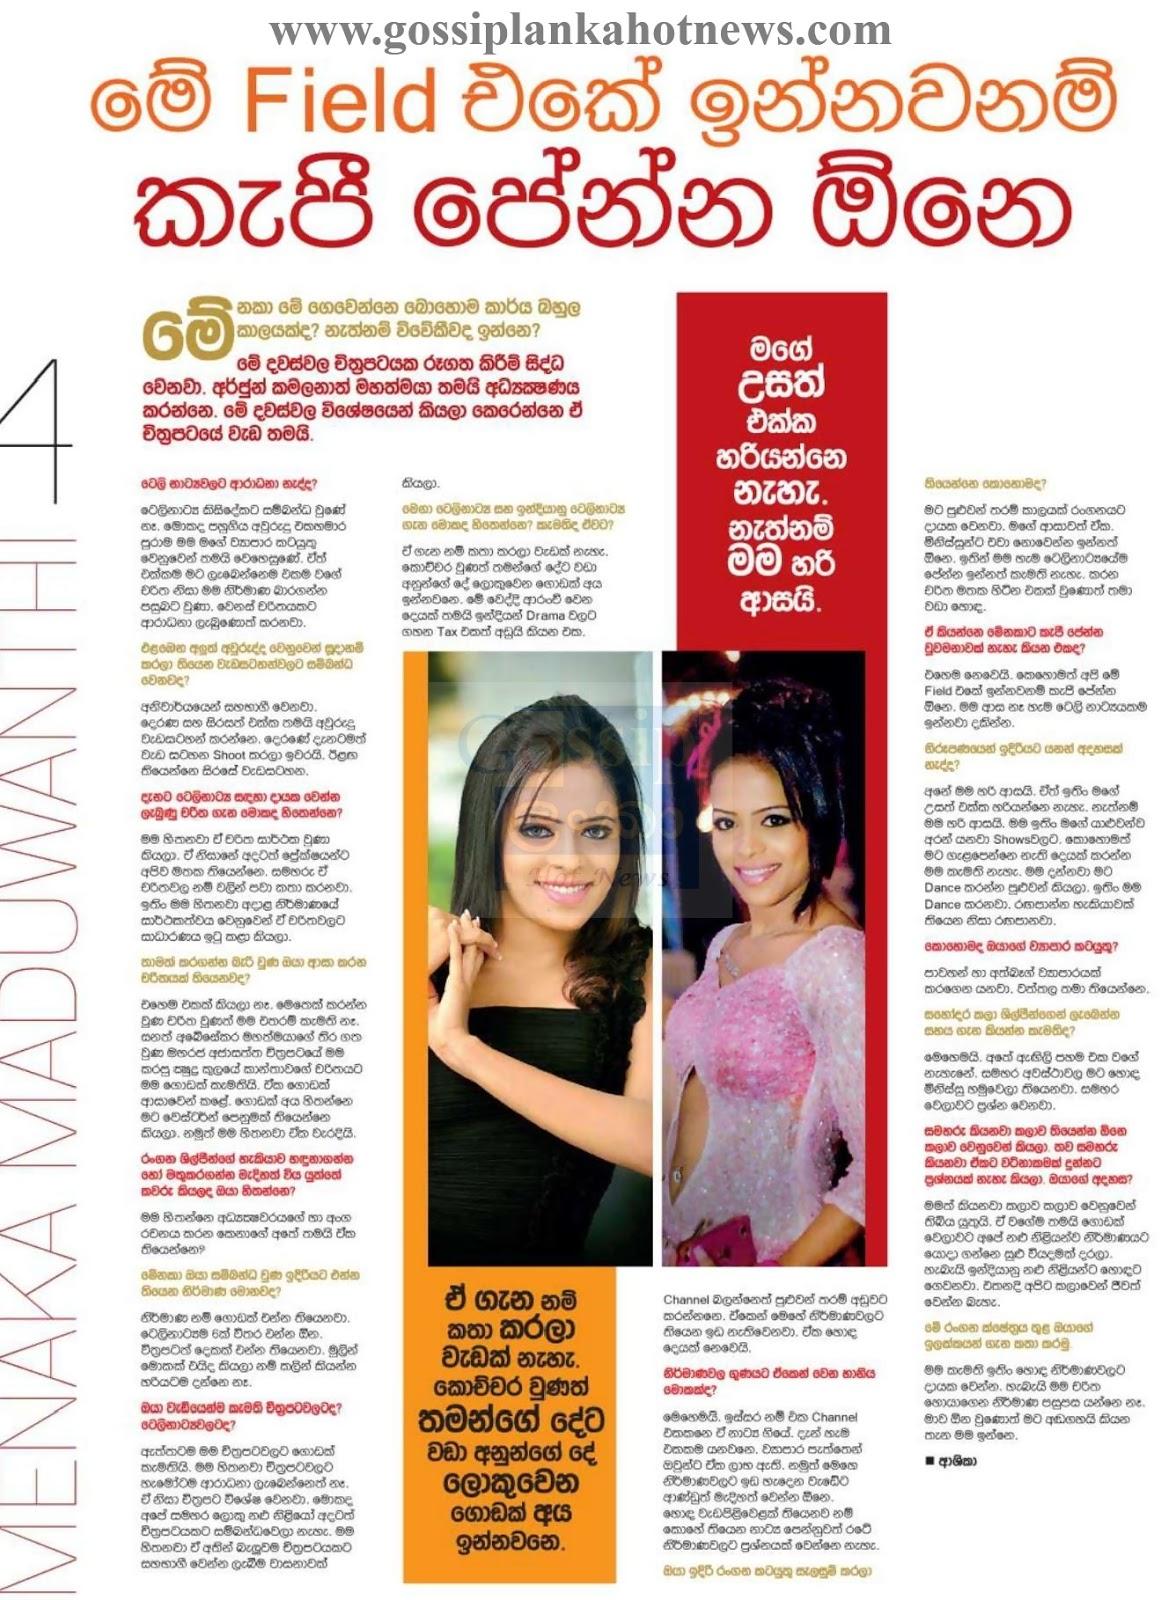 Sri Lankan Model Menaka Maduwanthi's latest